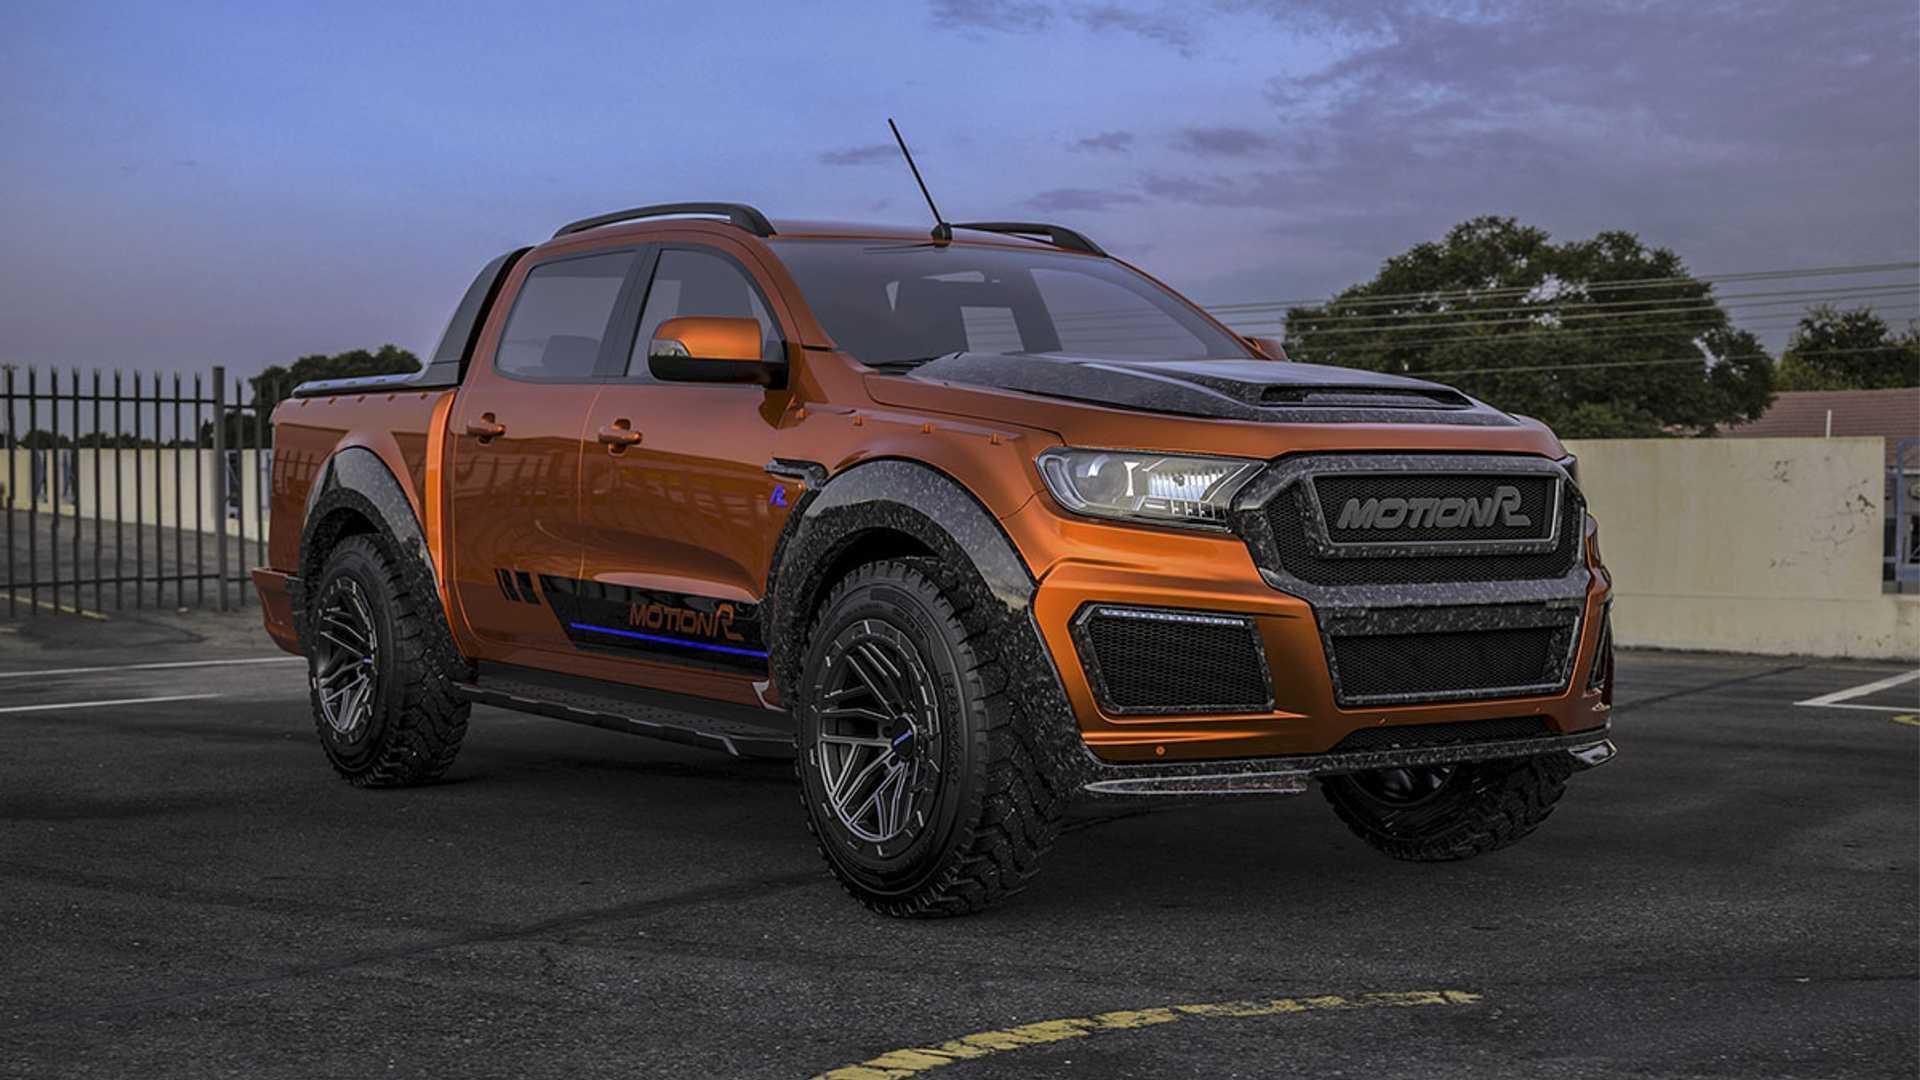 ford-ranger-by-motion-r-design